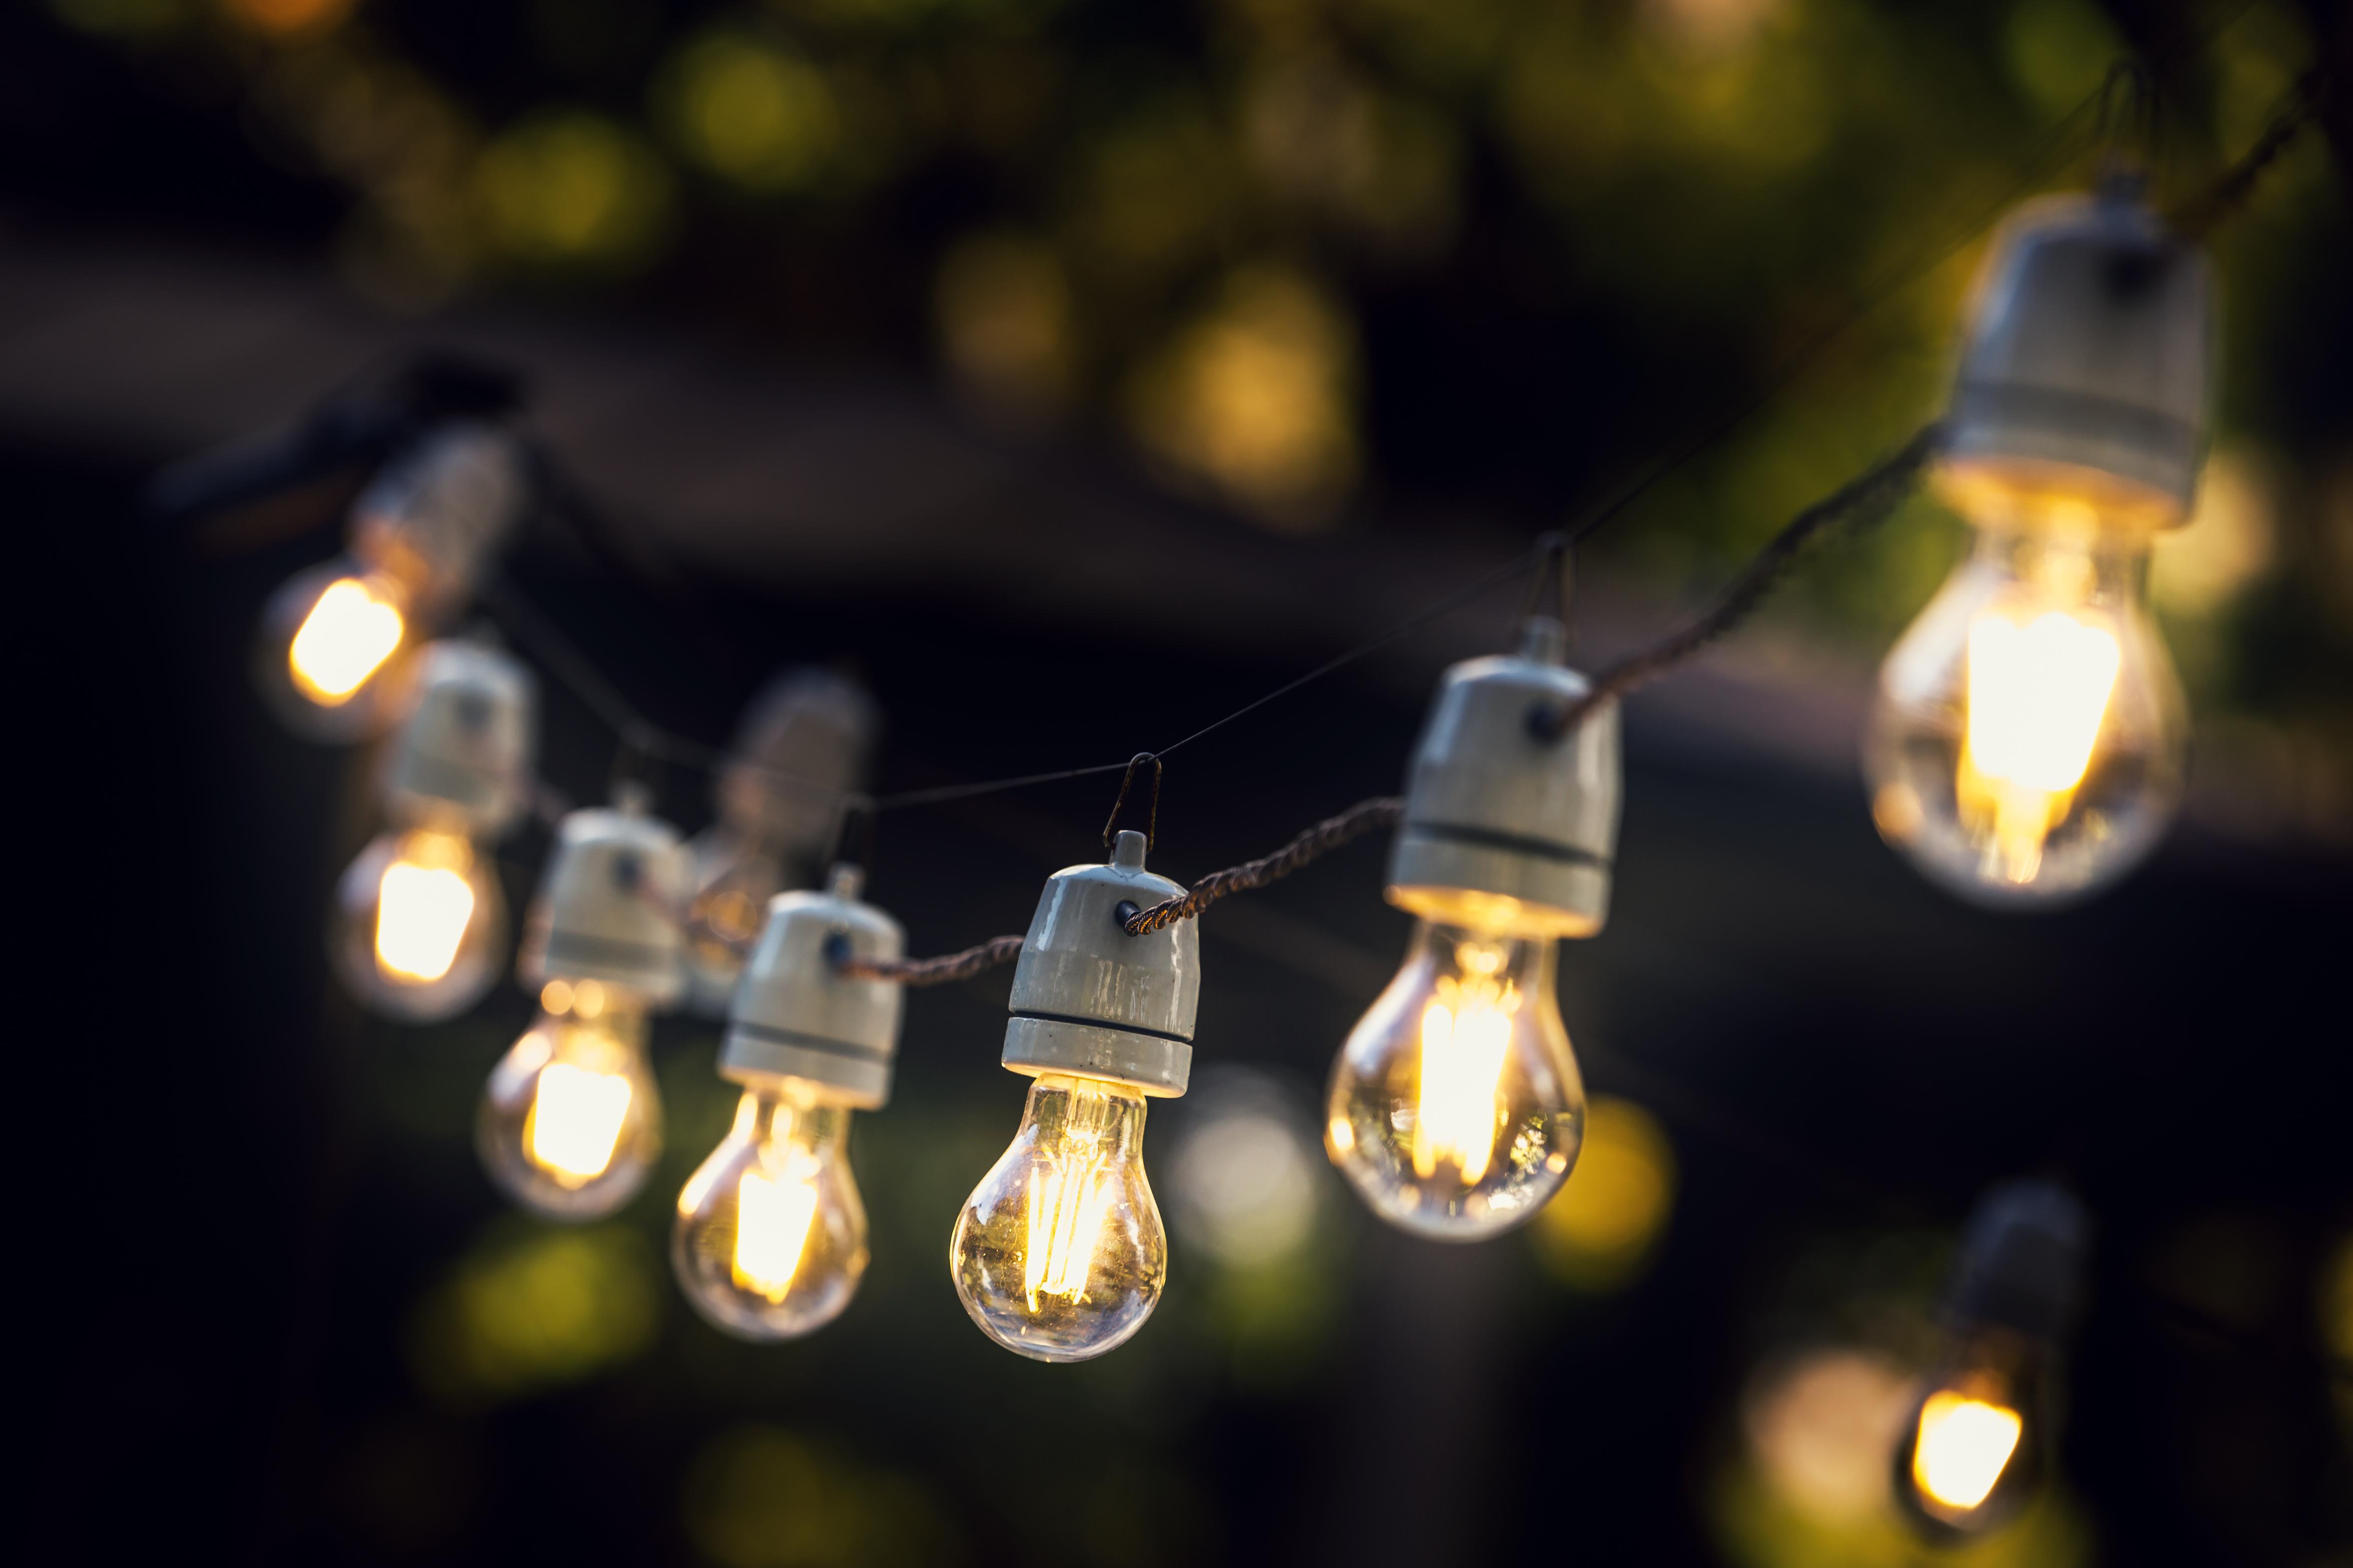 Outdoor Lighting Design - Tim Kyle Electric